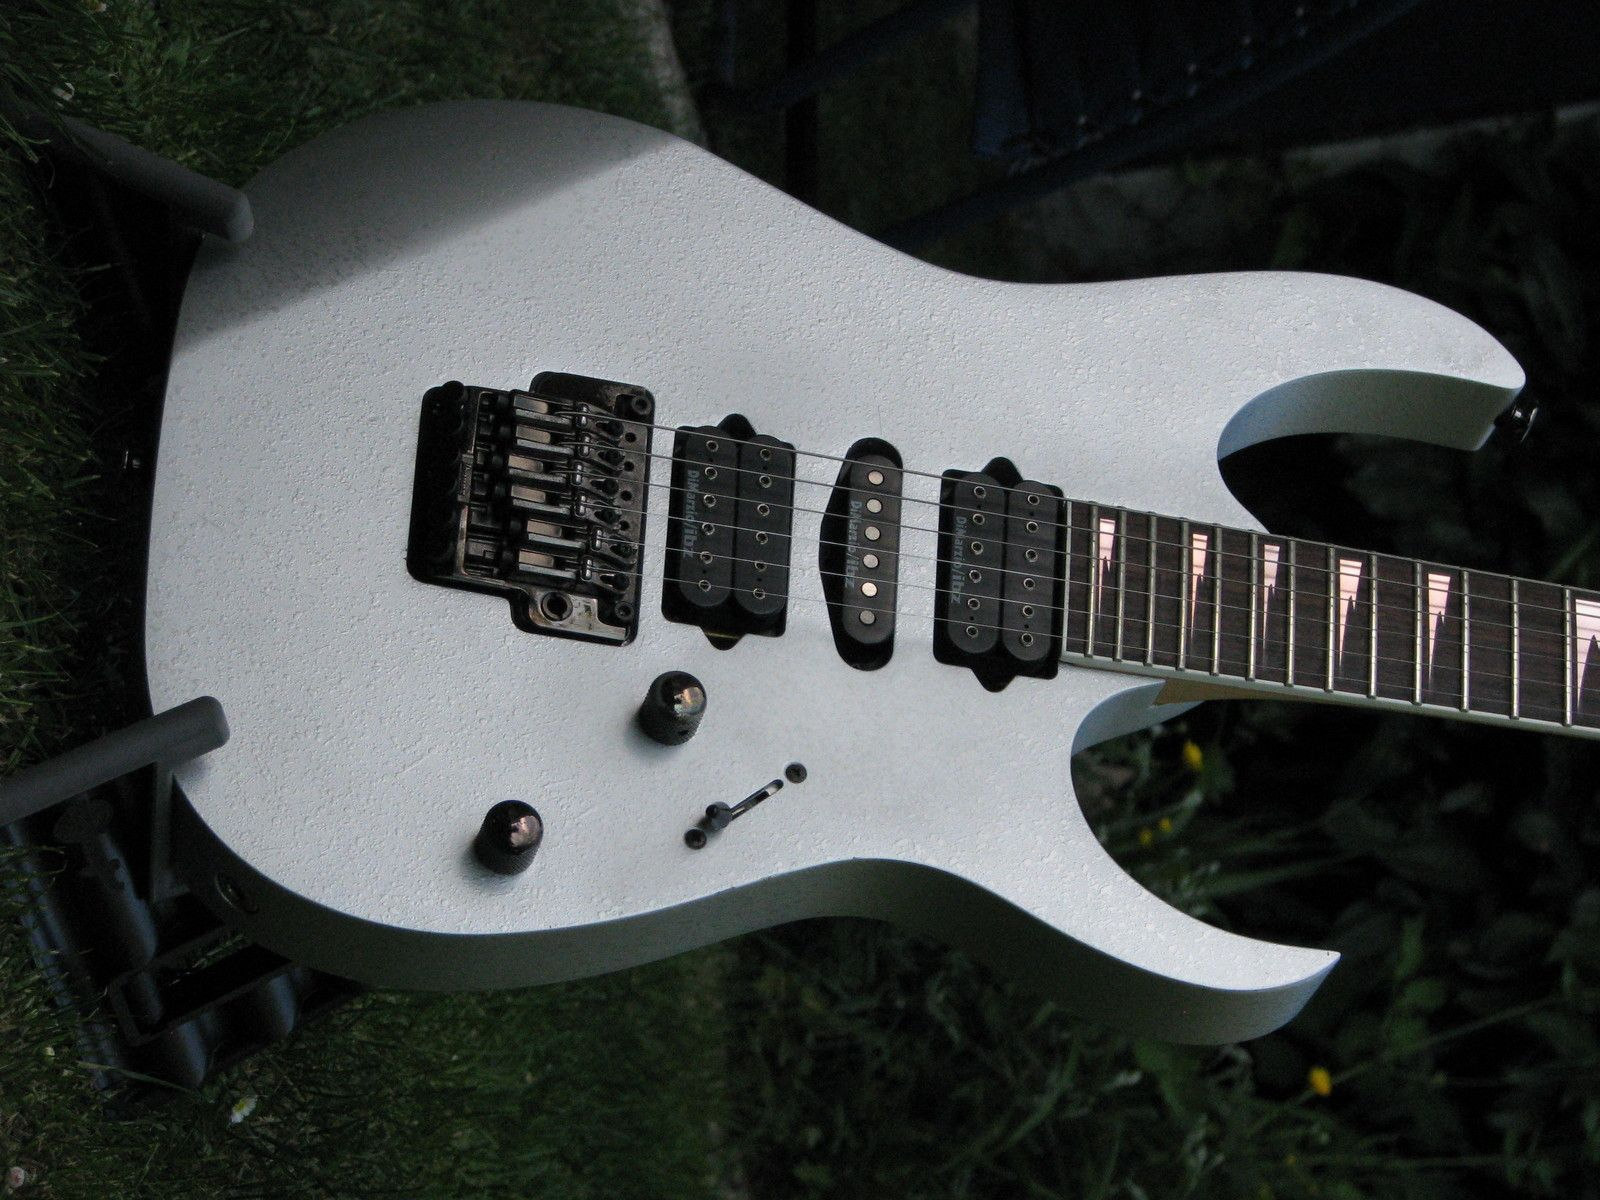 Ibanez Guitar Wiring Diagrams Besides Guitar Ibanez Rg Wiring Diagram